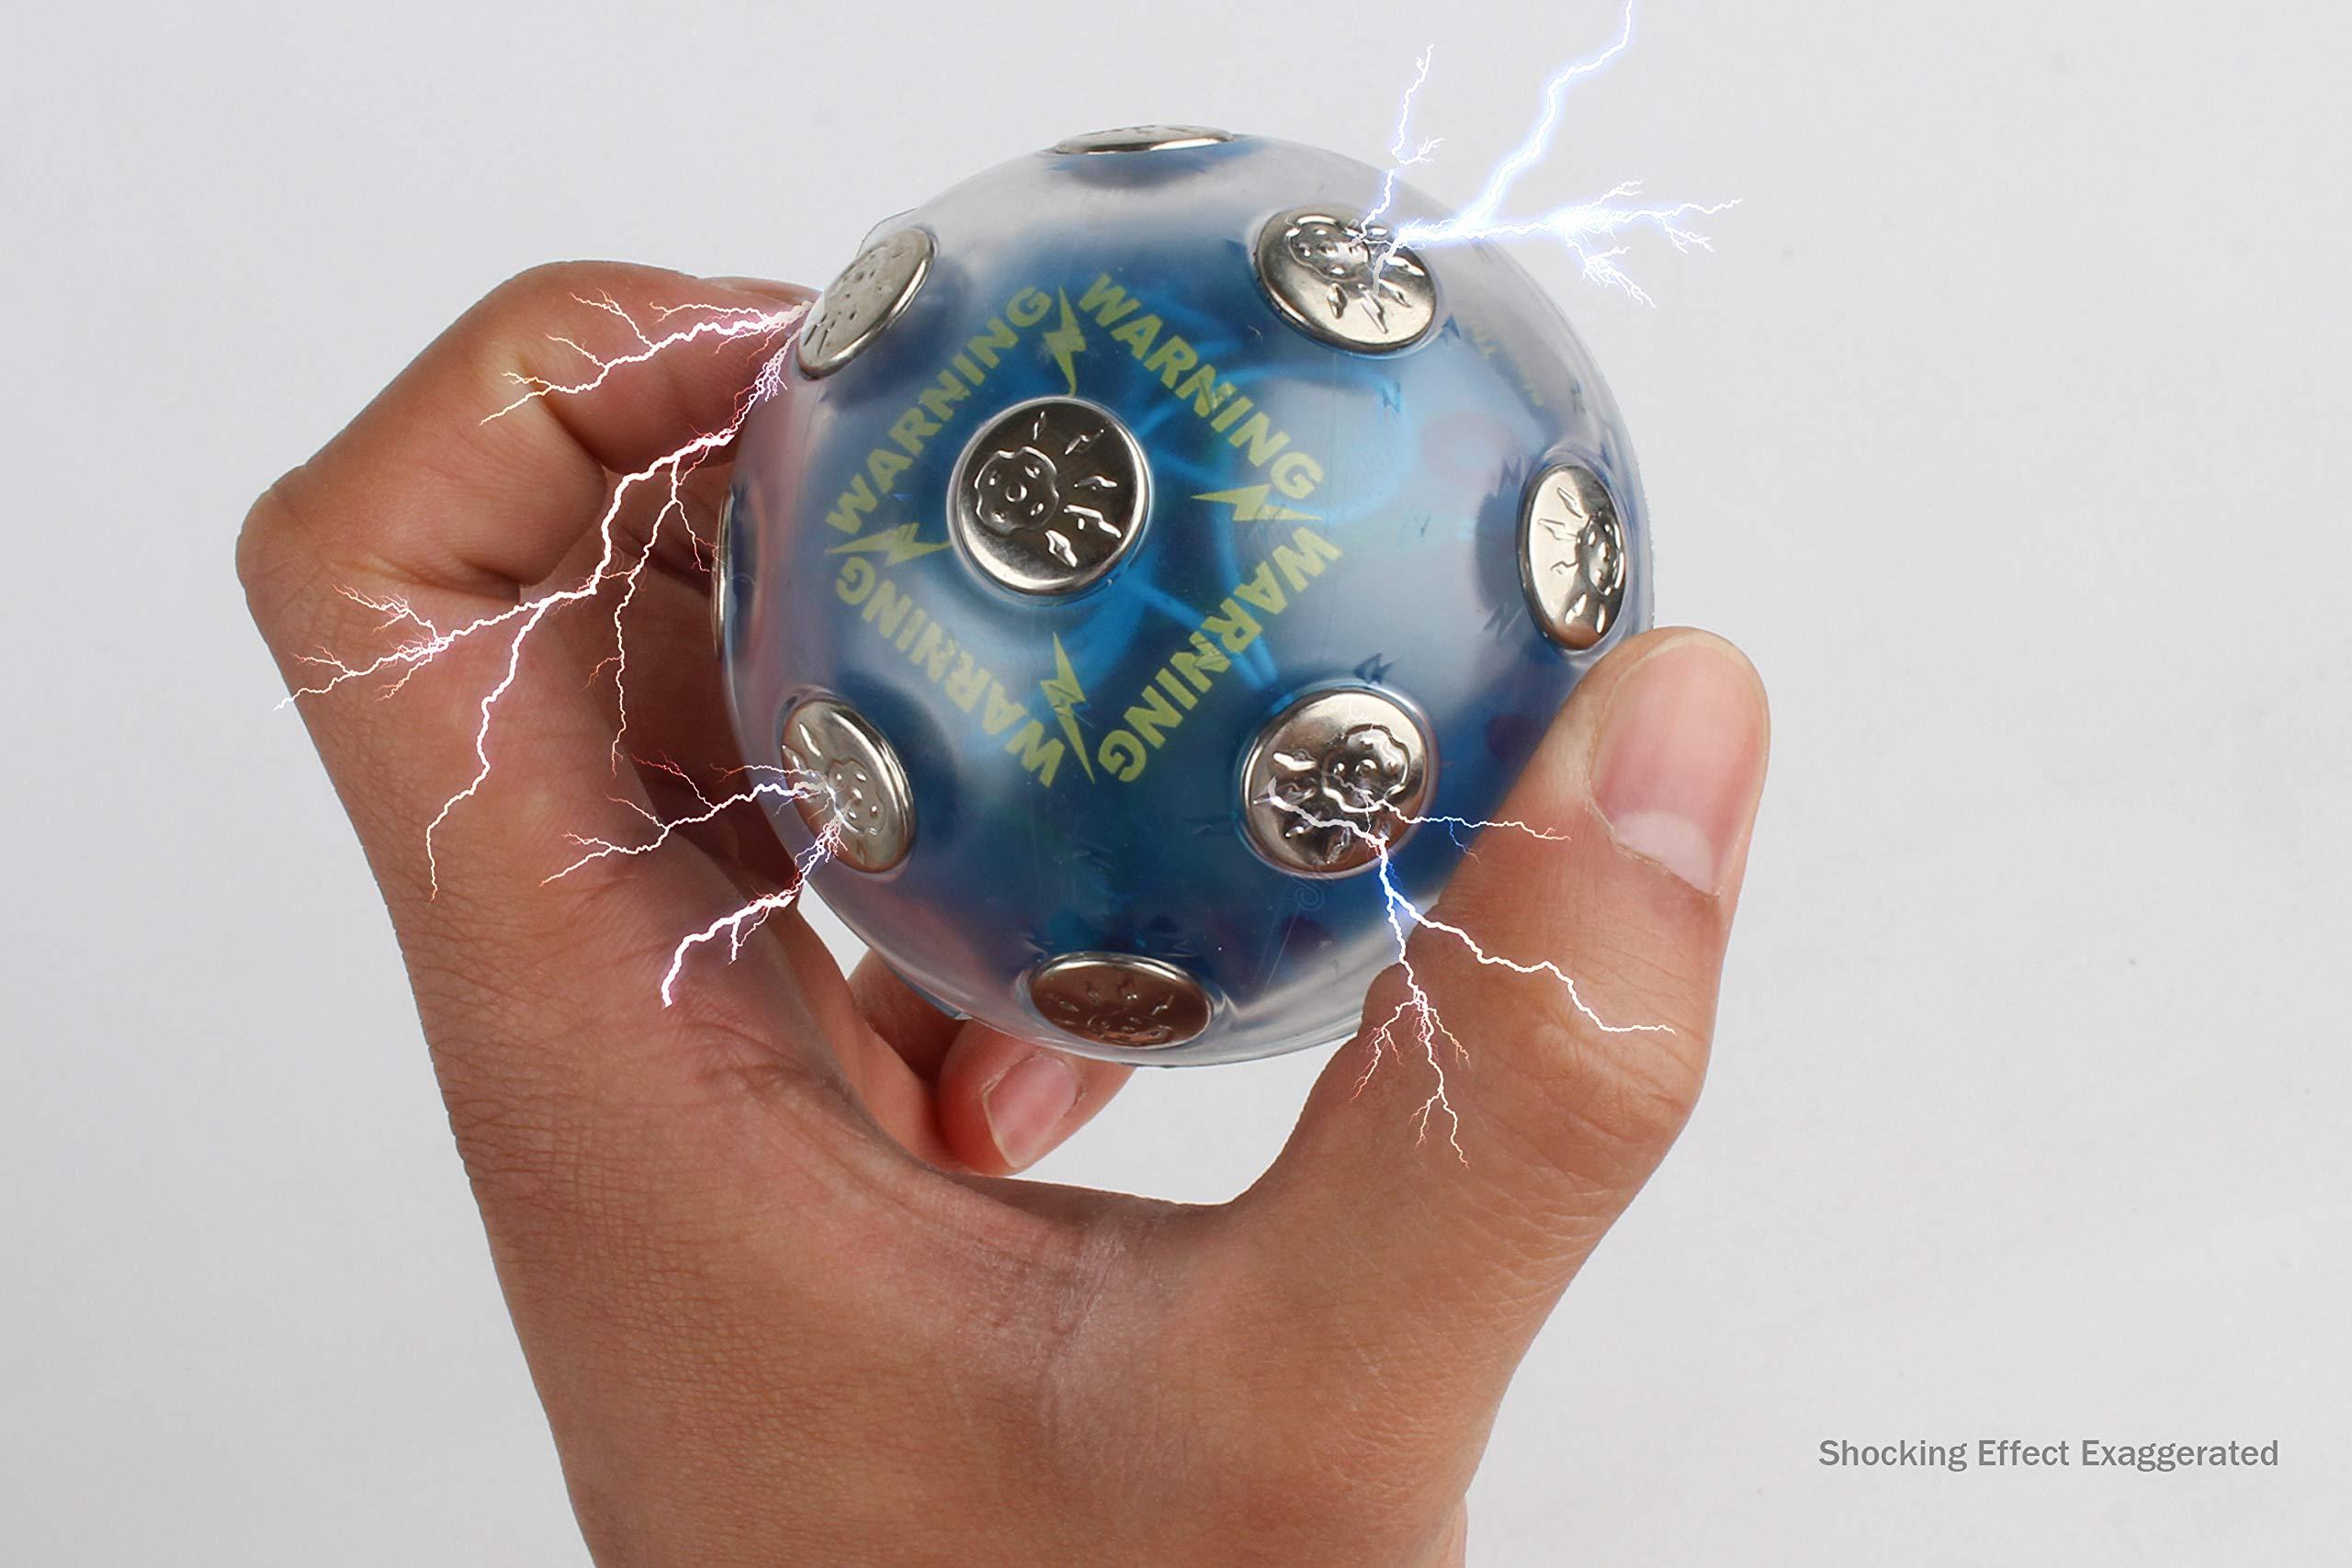 Daron Shock Ball Hot Potato Game by Daron (Image #5)